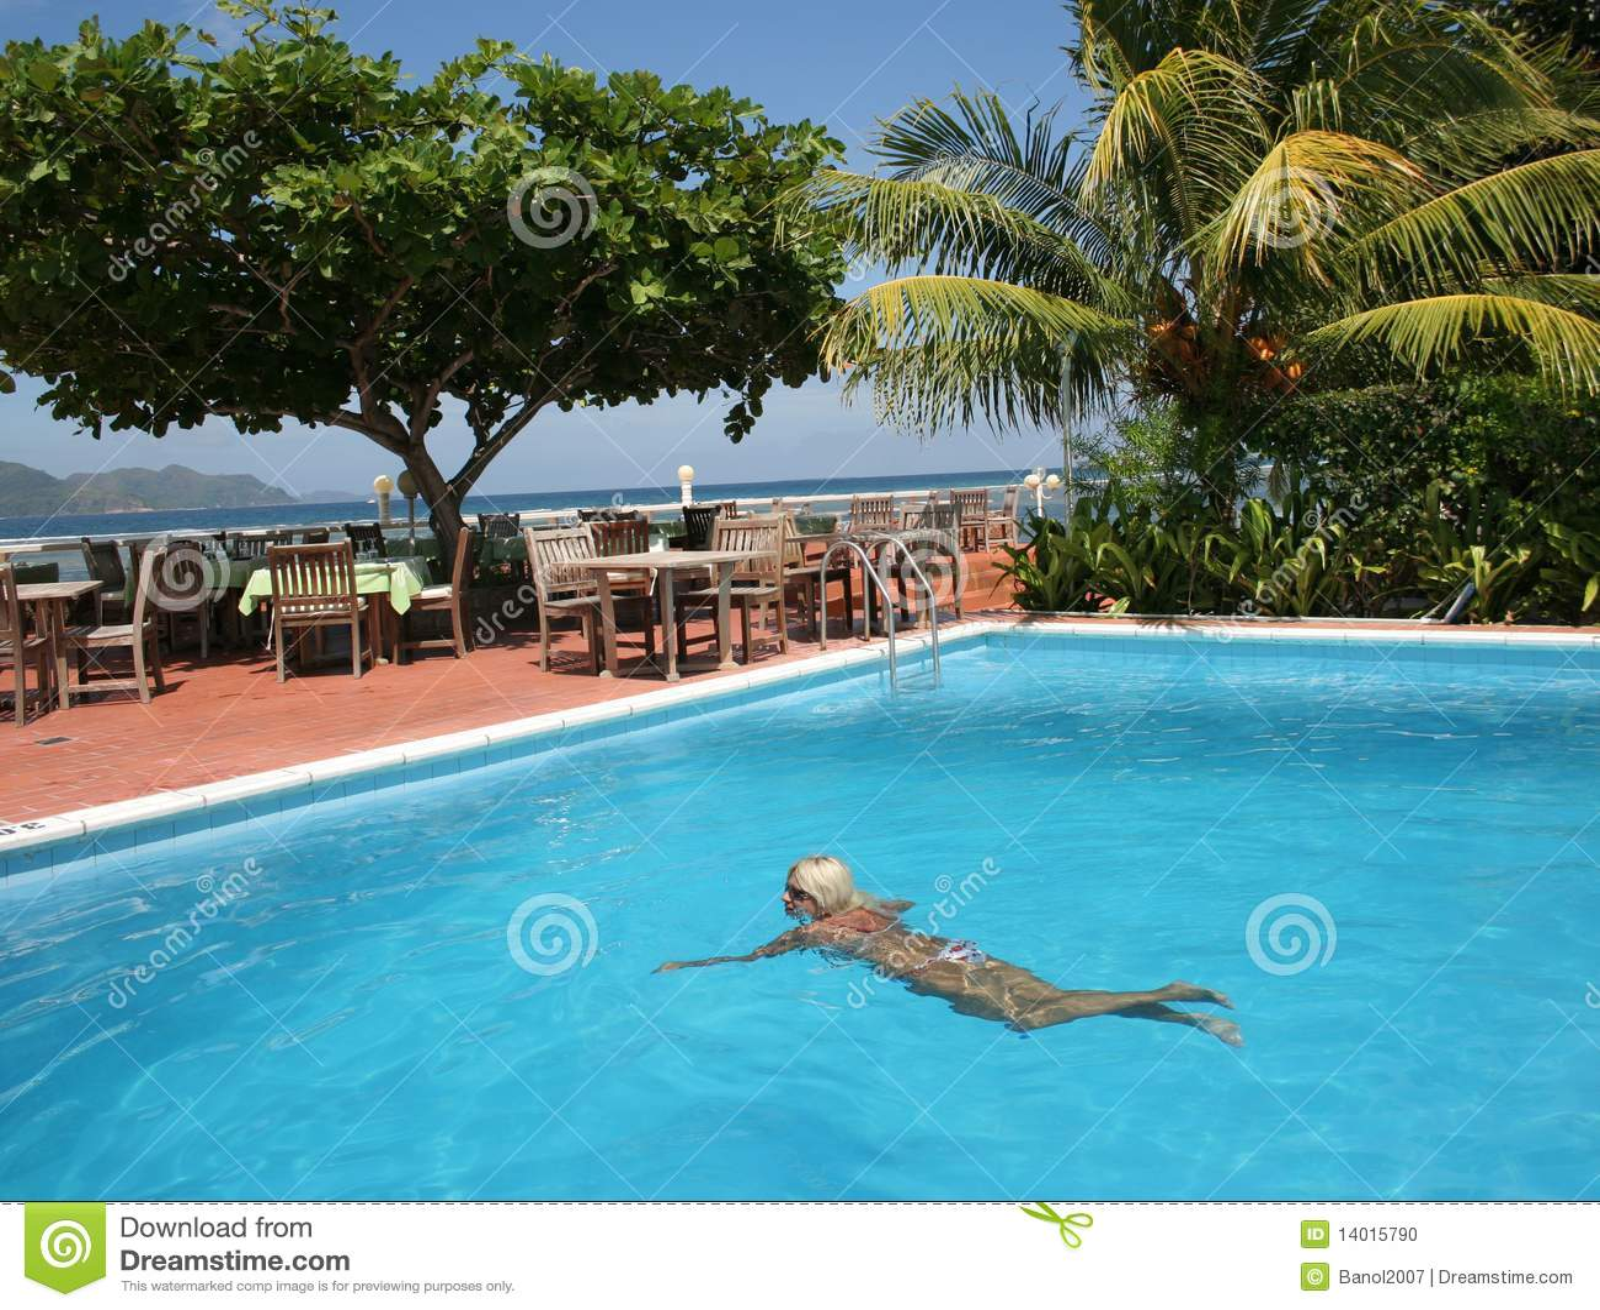 Mujer en piscina de la playa foto de archivo imagen - Piscina de playa ...